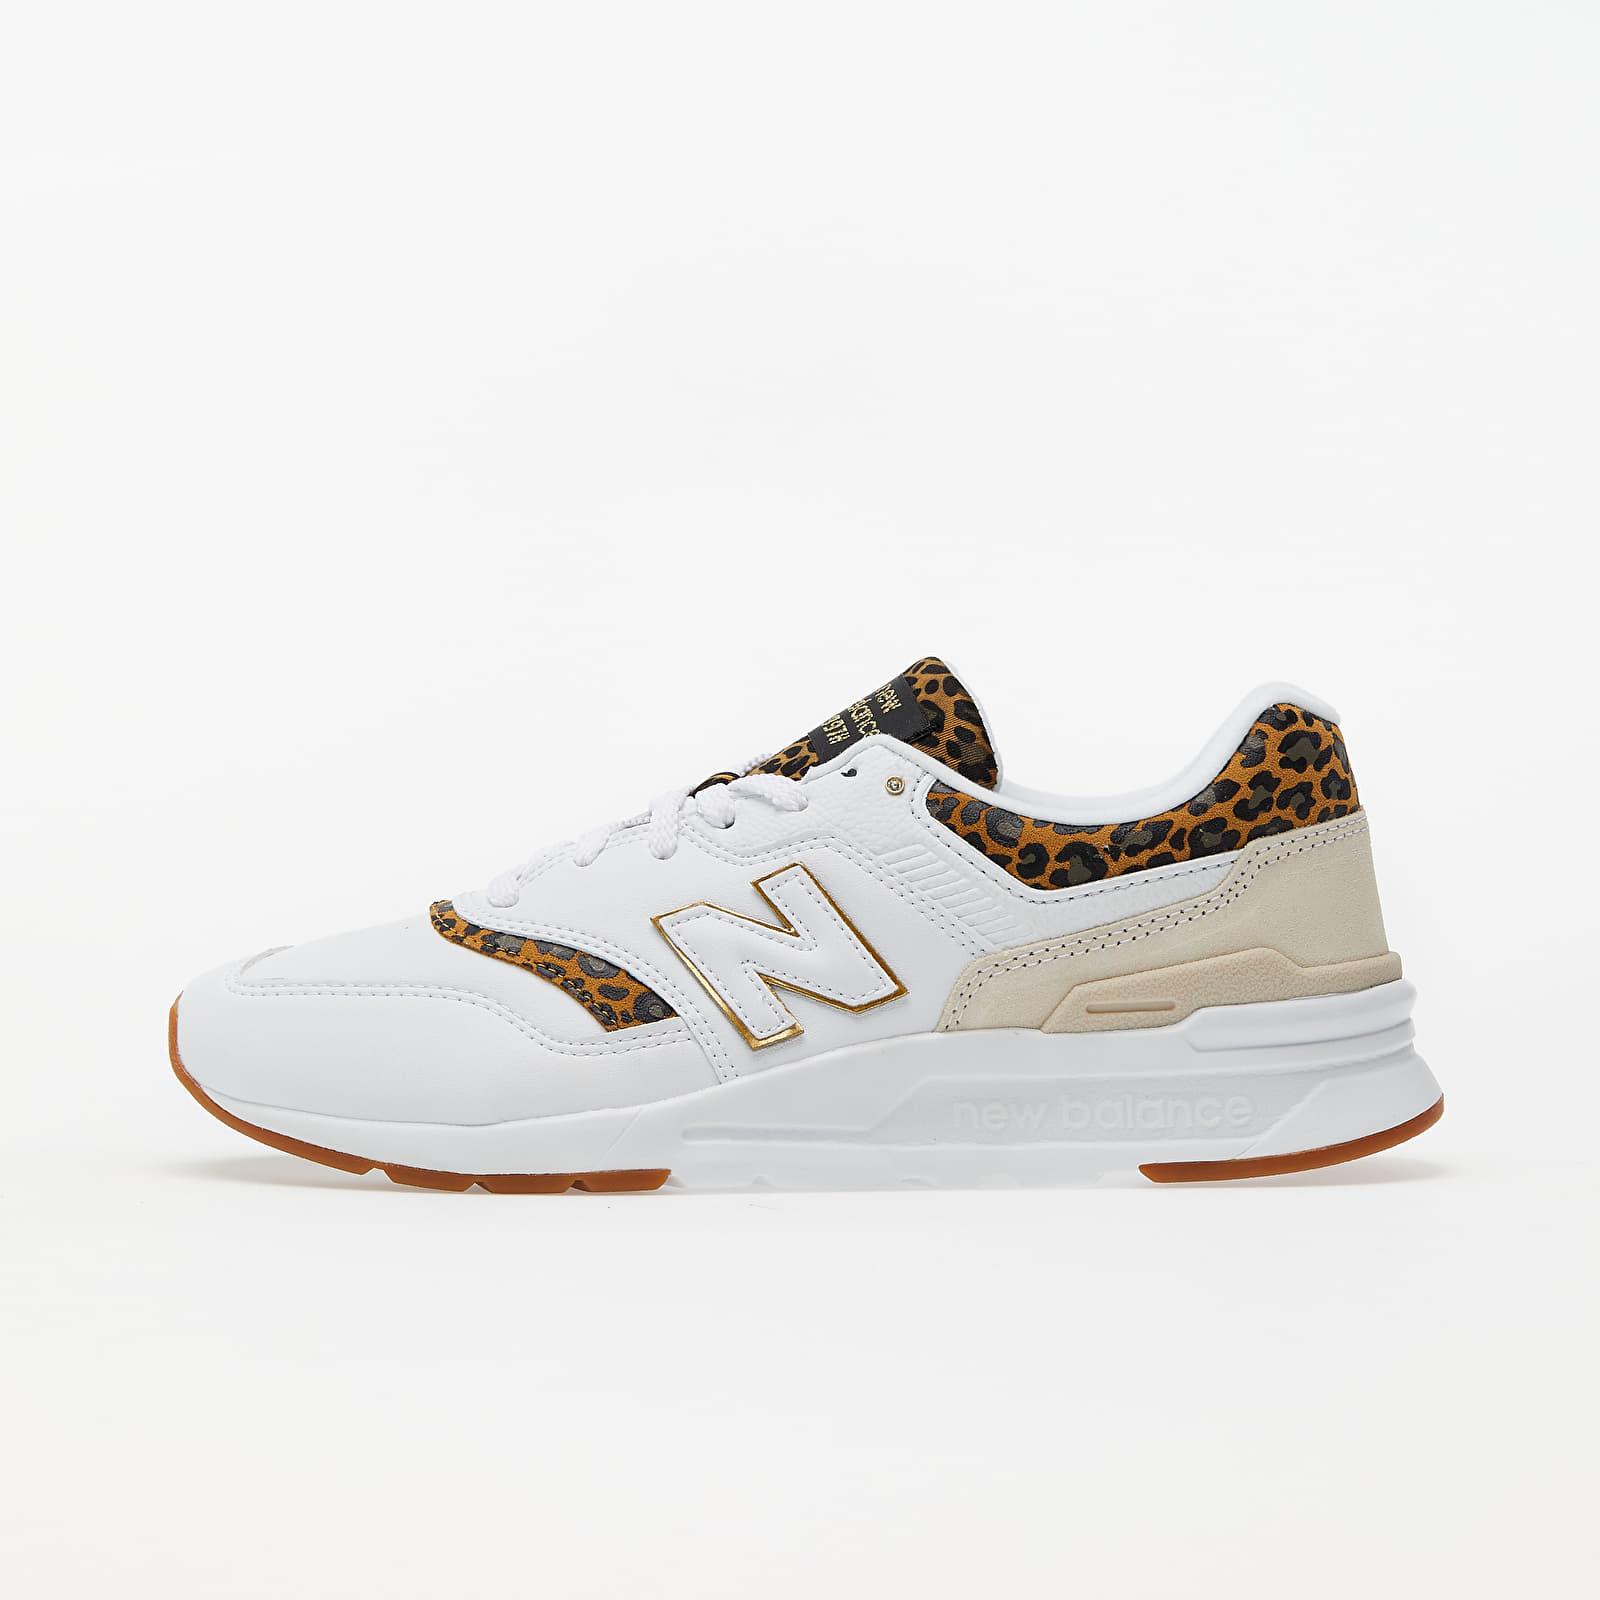 New Balance 997 White | Footshop